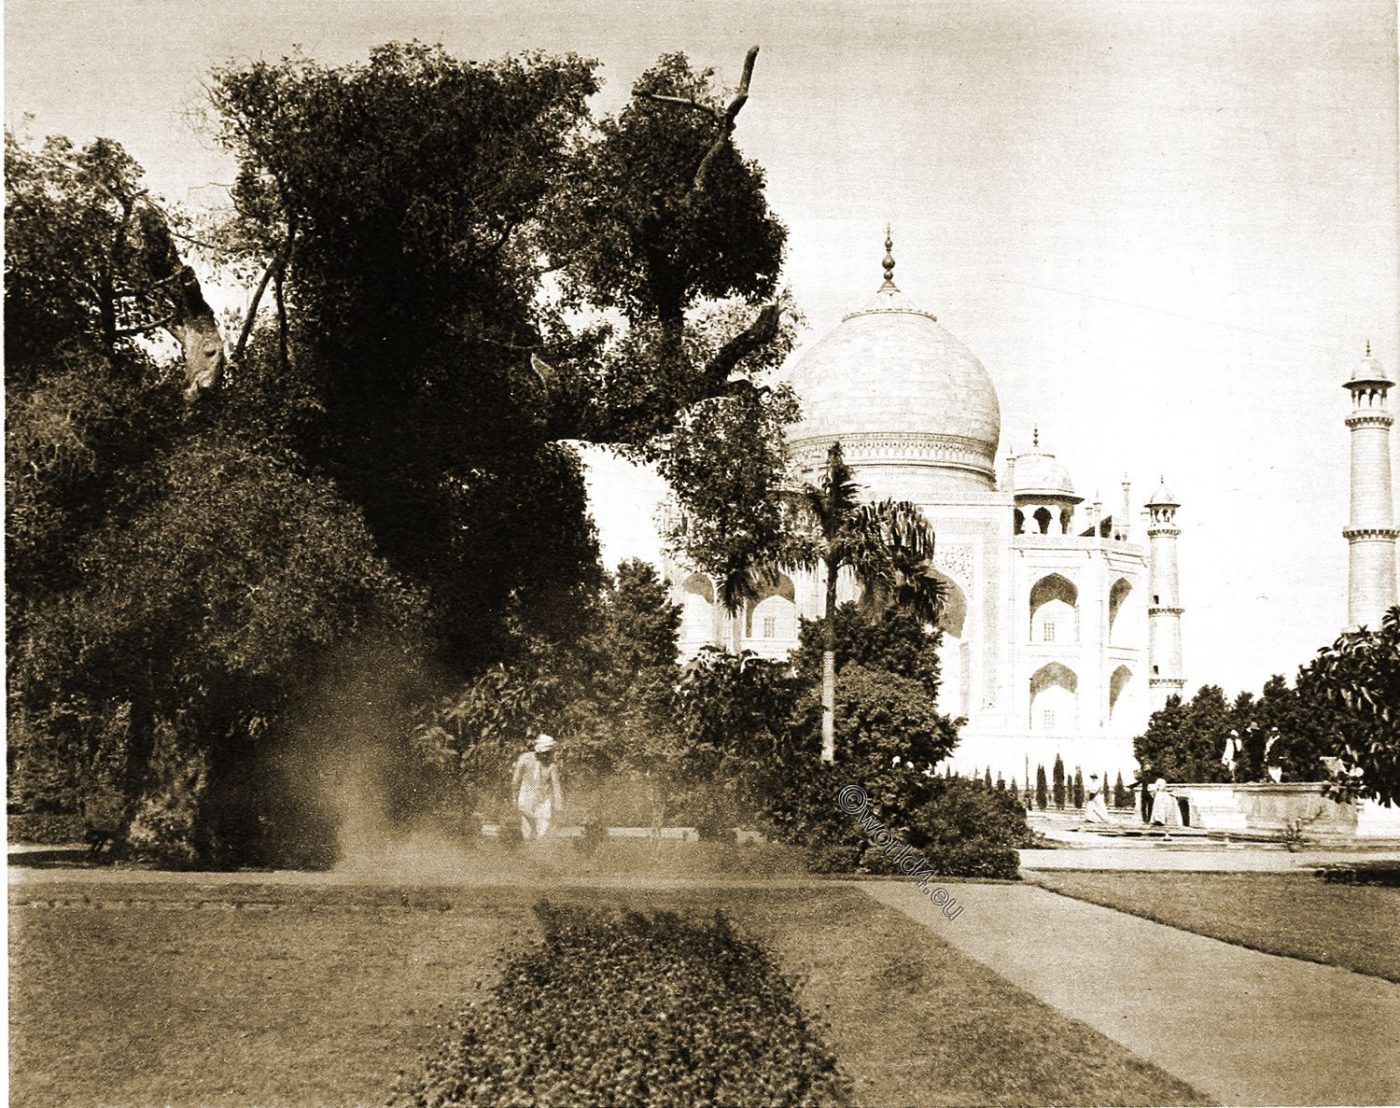 Taj Mahal, Agra, India, Mausoleum